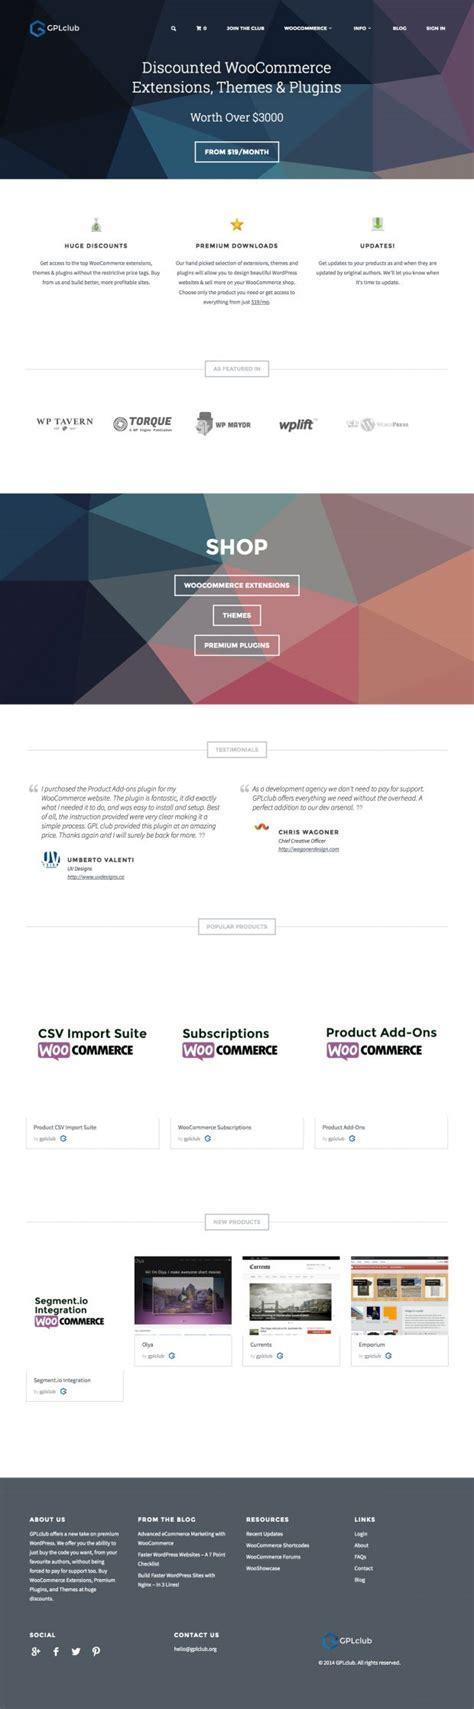 wordpress themes design inspiration gplclub premium wordpress and woocommerce themes